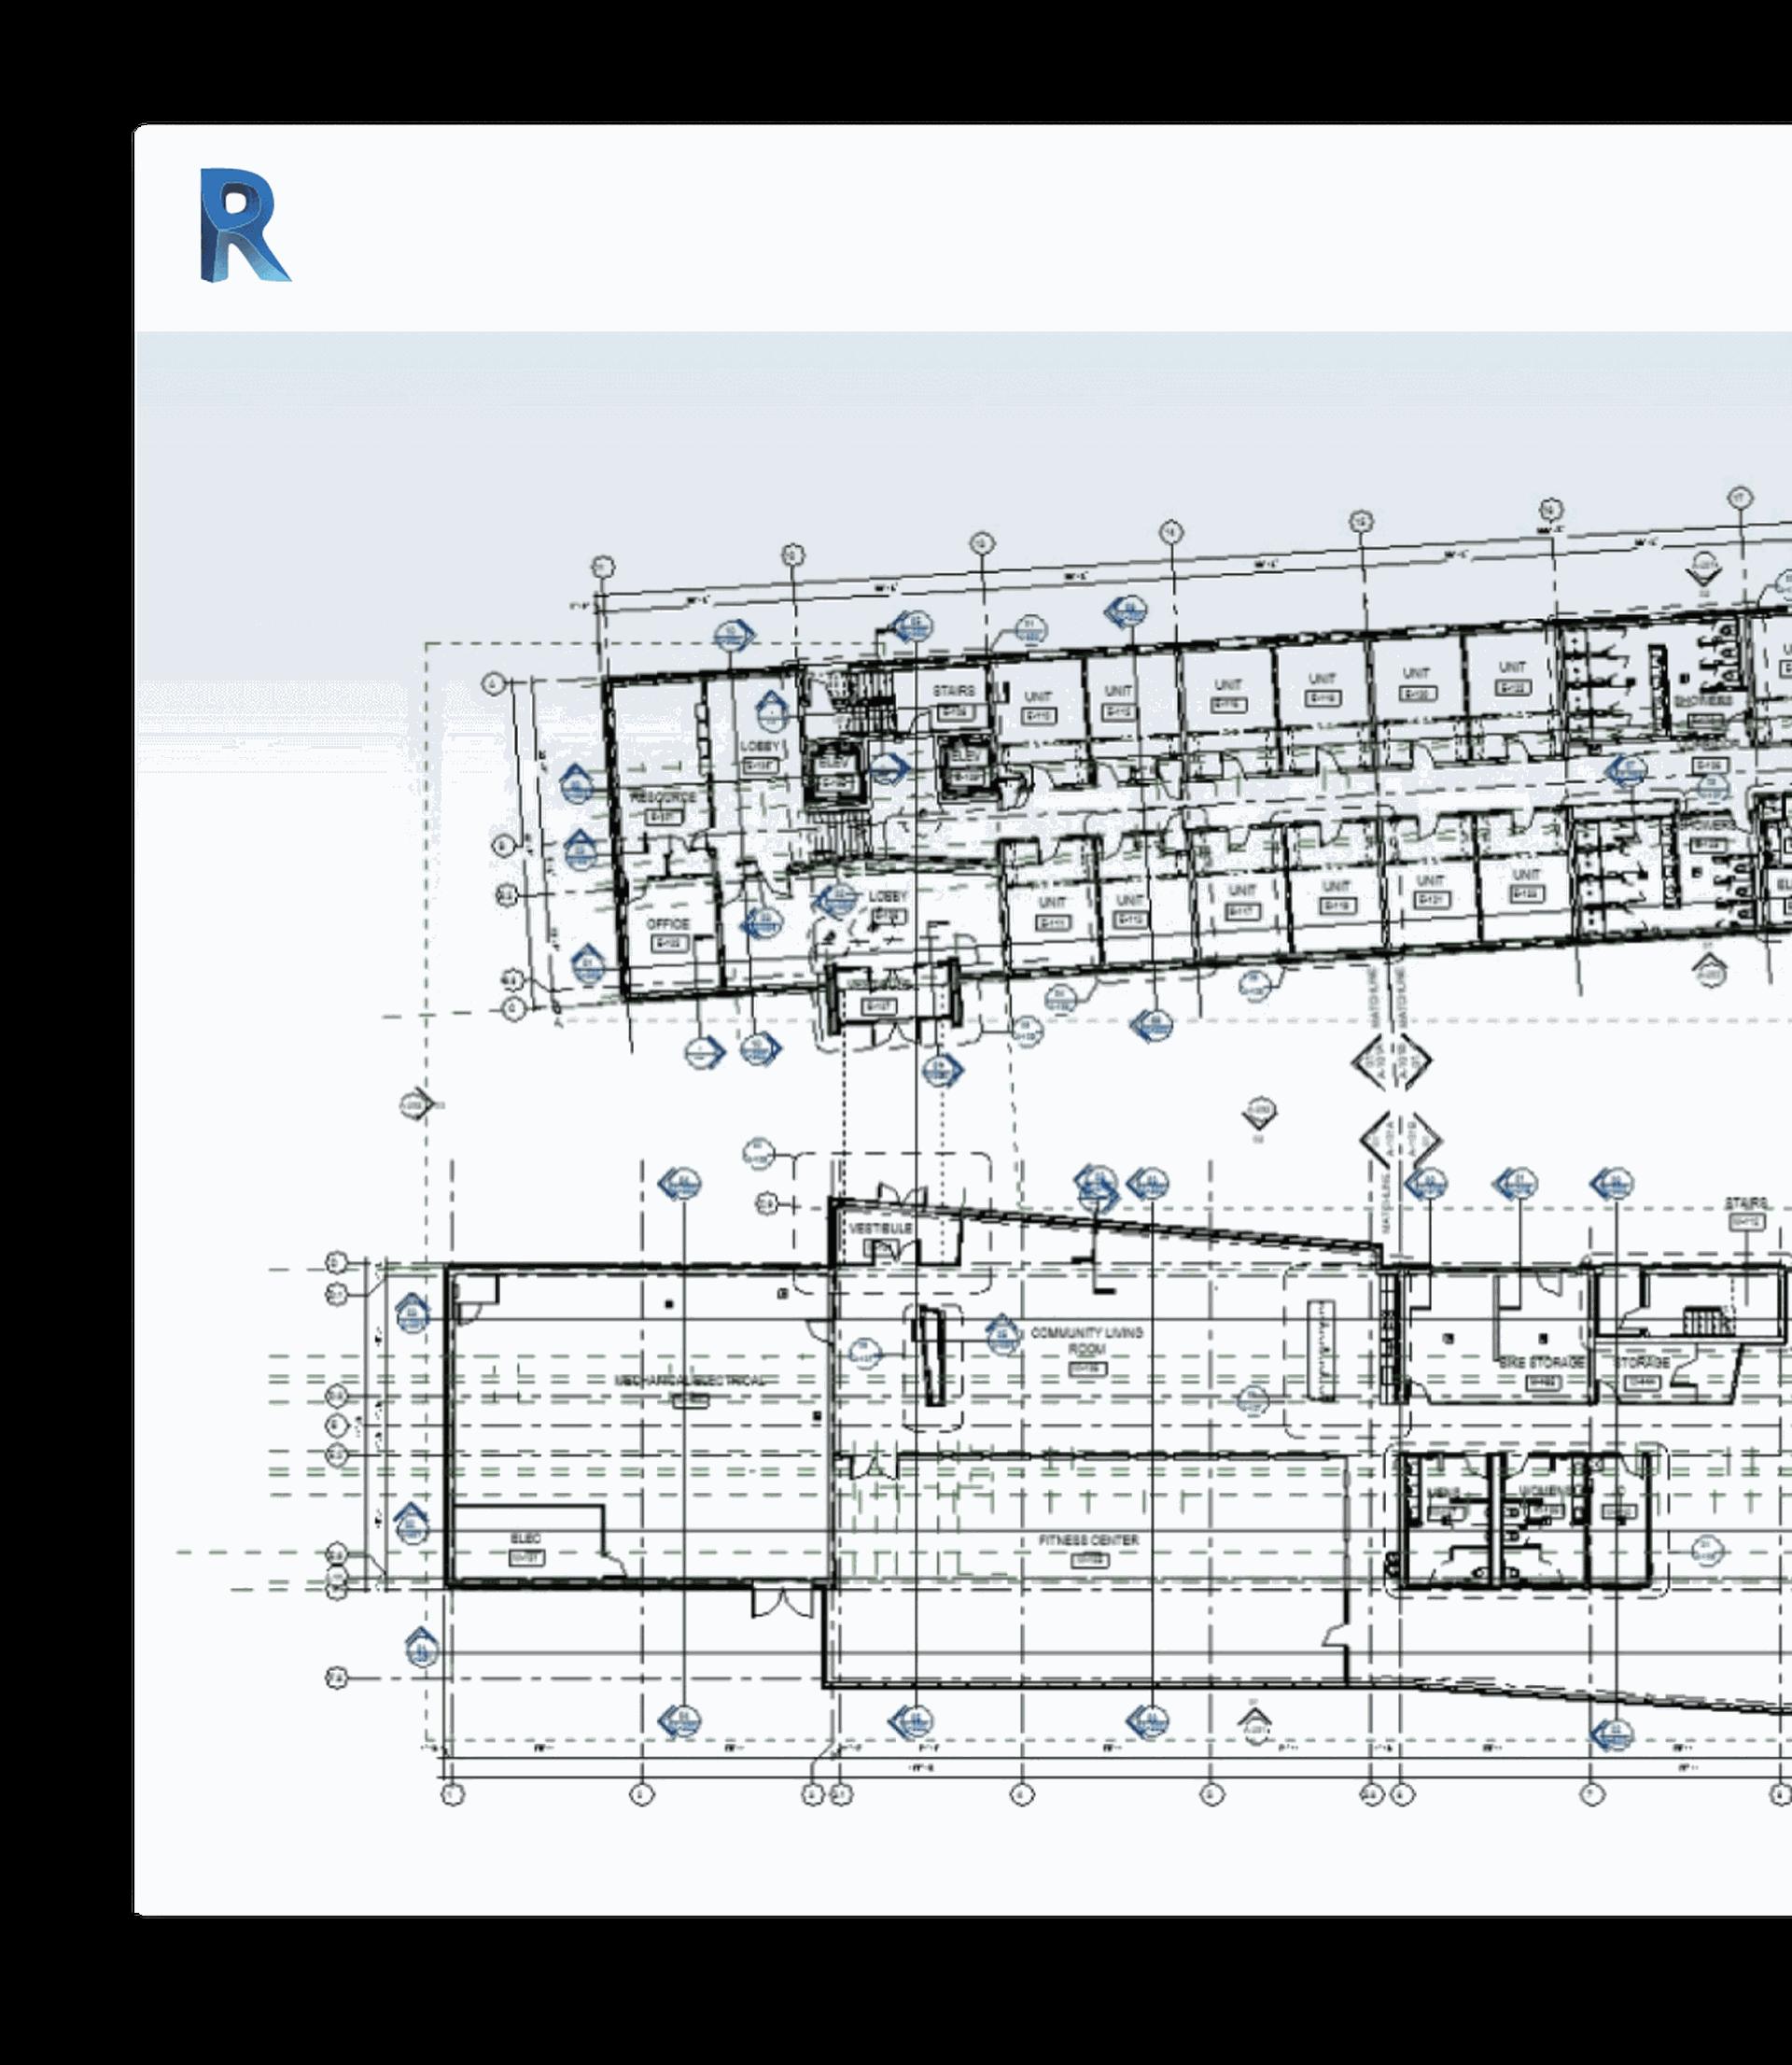 Revit drawing to help create model-based designs.